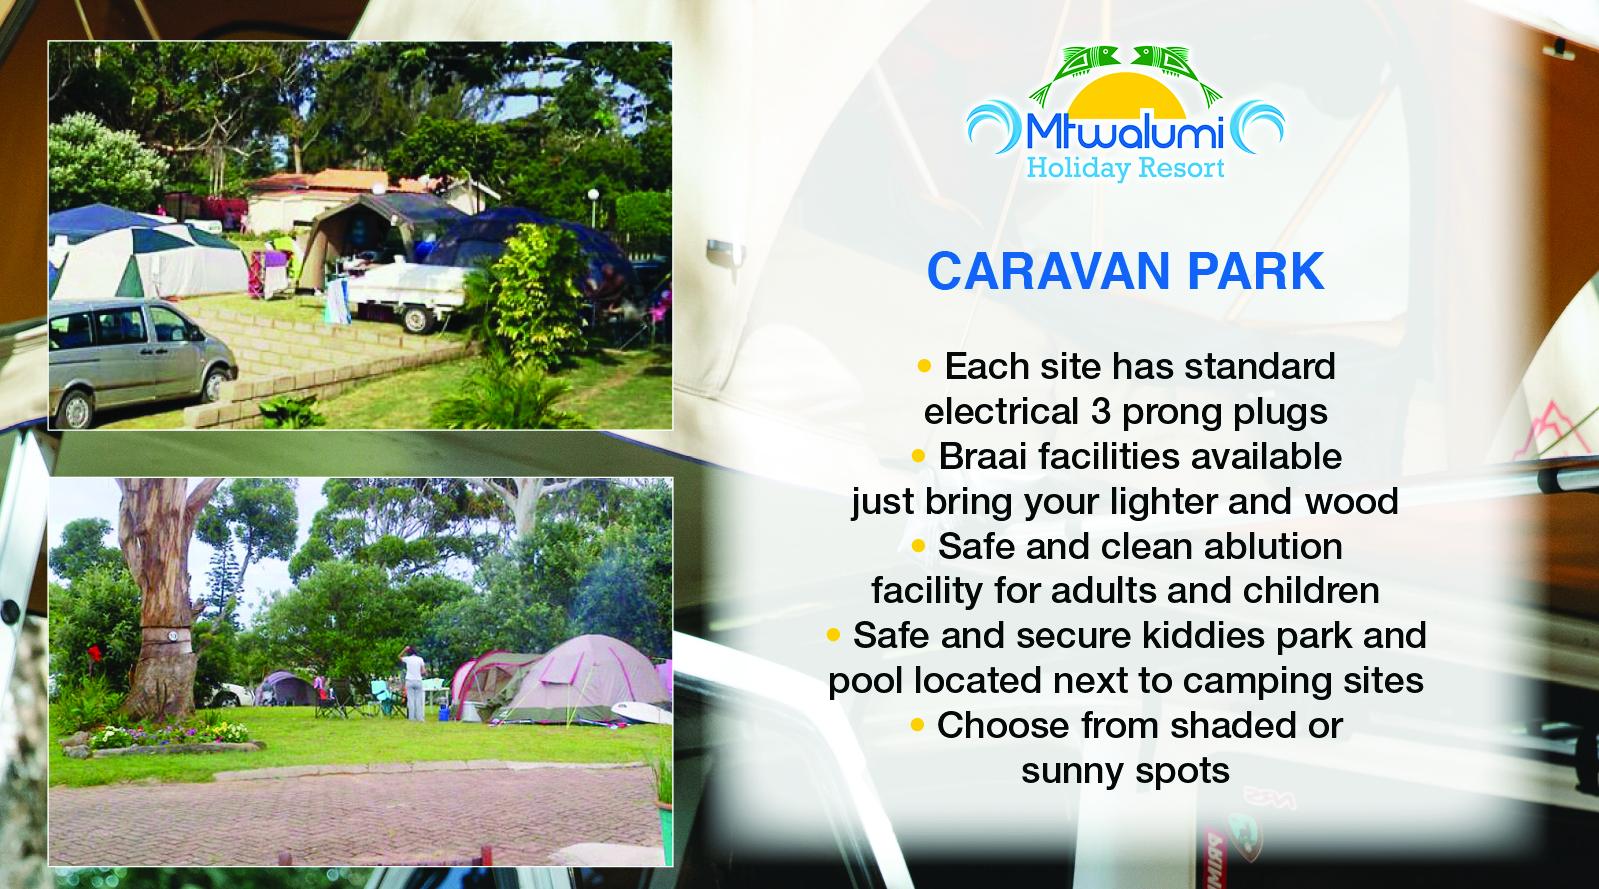 caravan_park